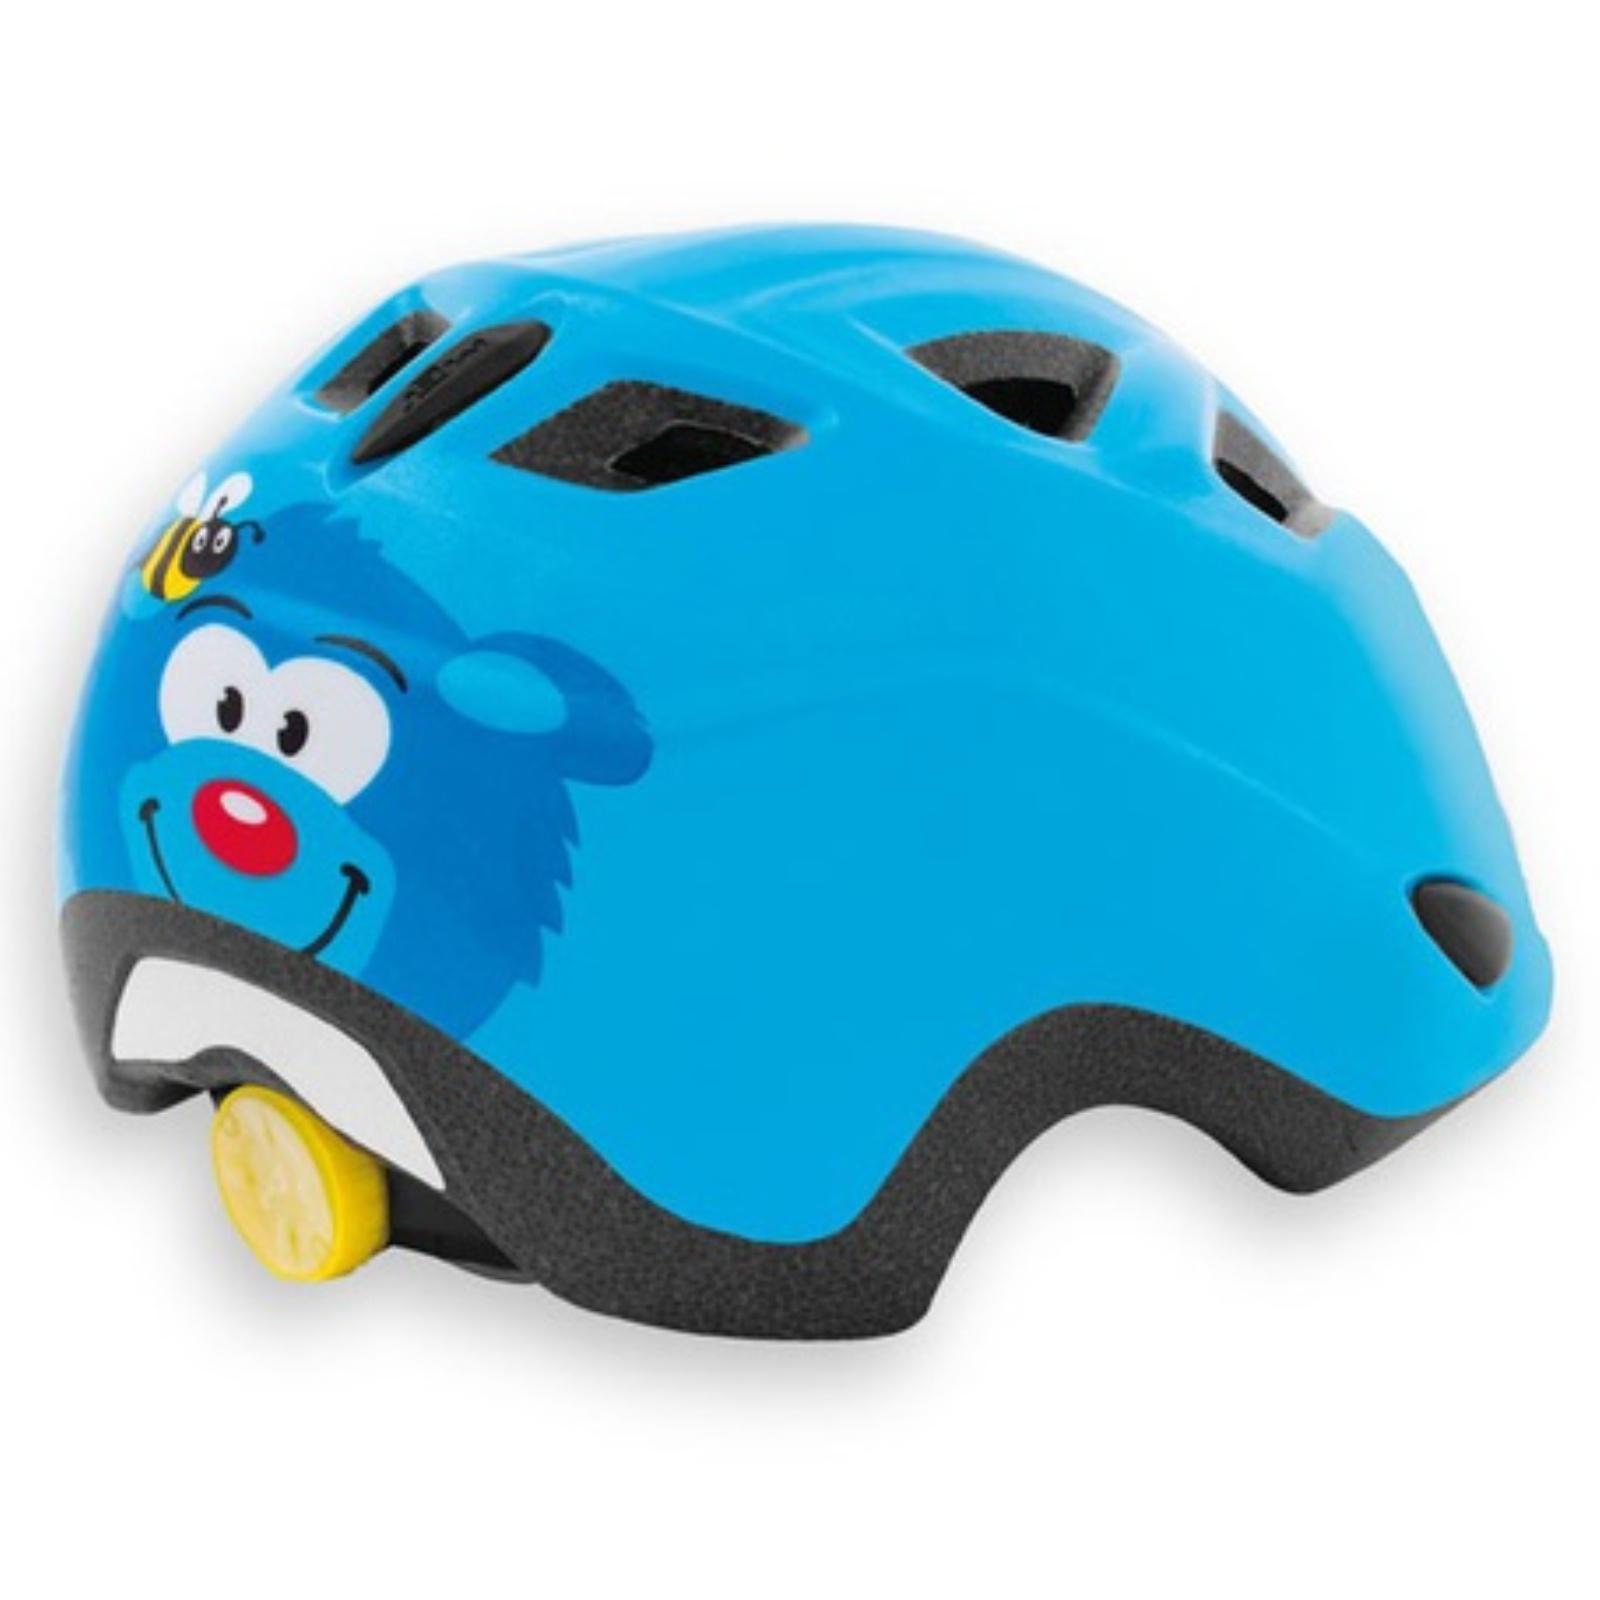 Cyklo přilba MET Elfo 46-53 medvěd-modrá